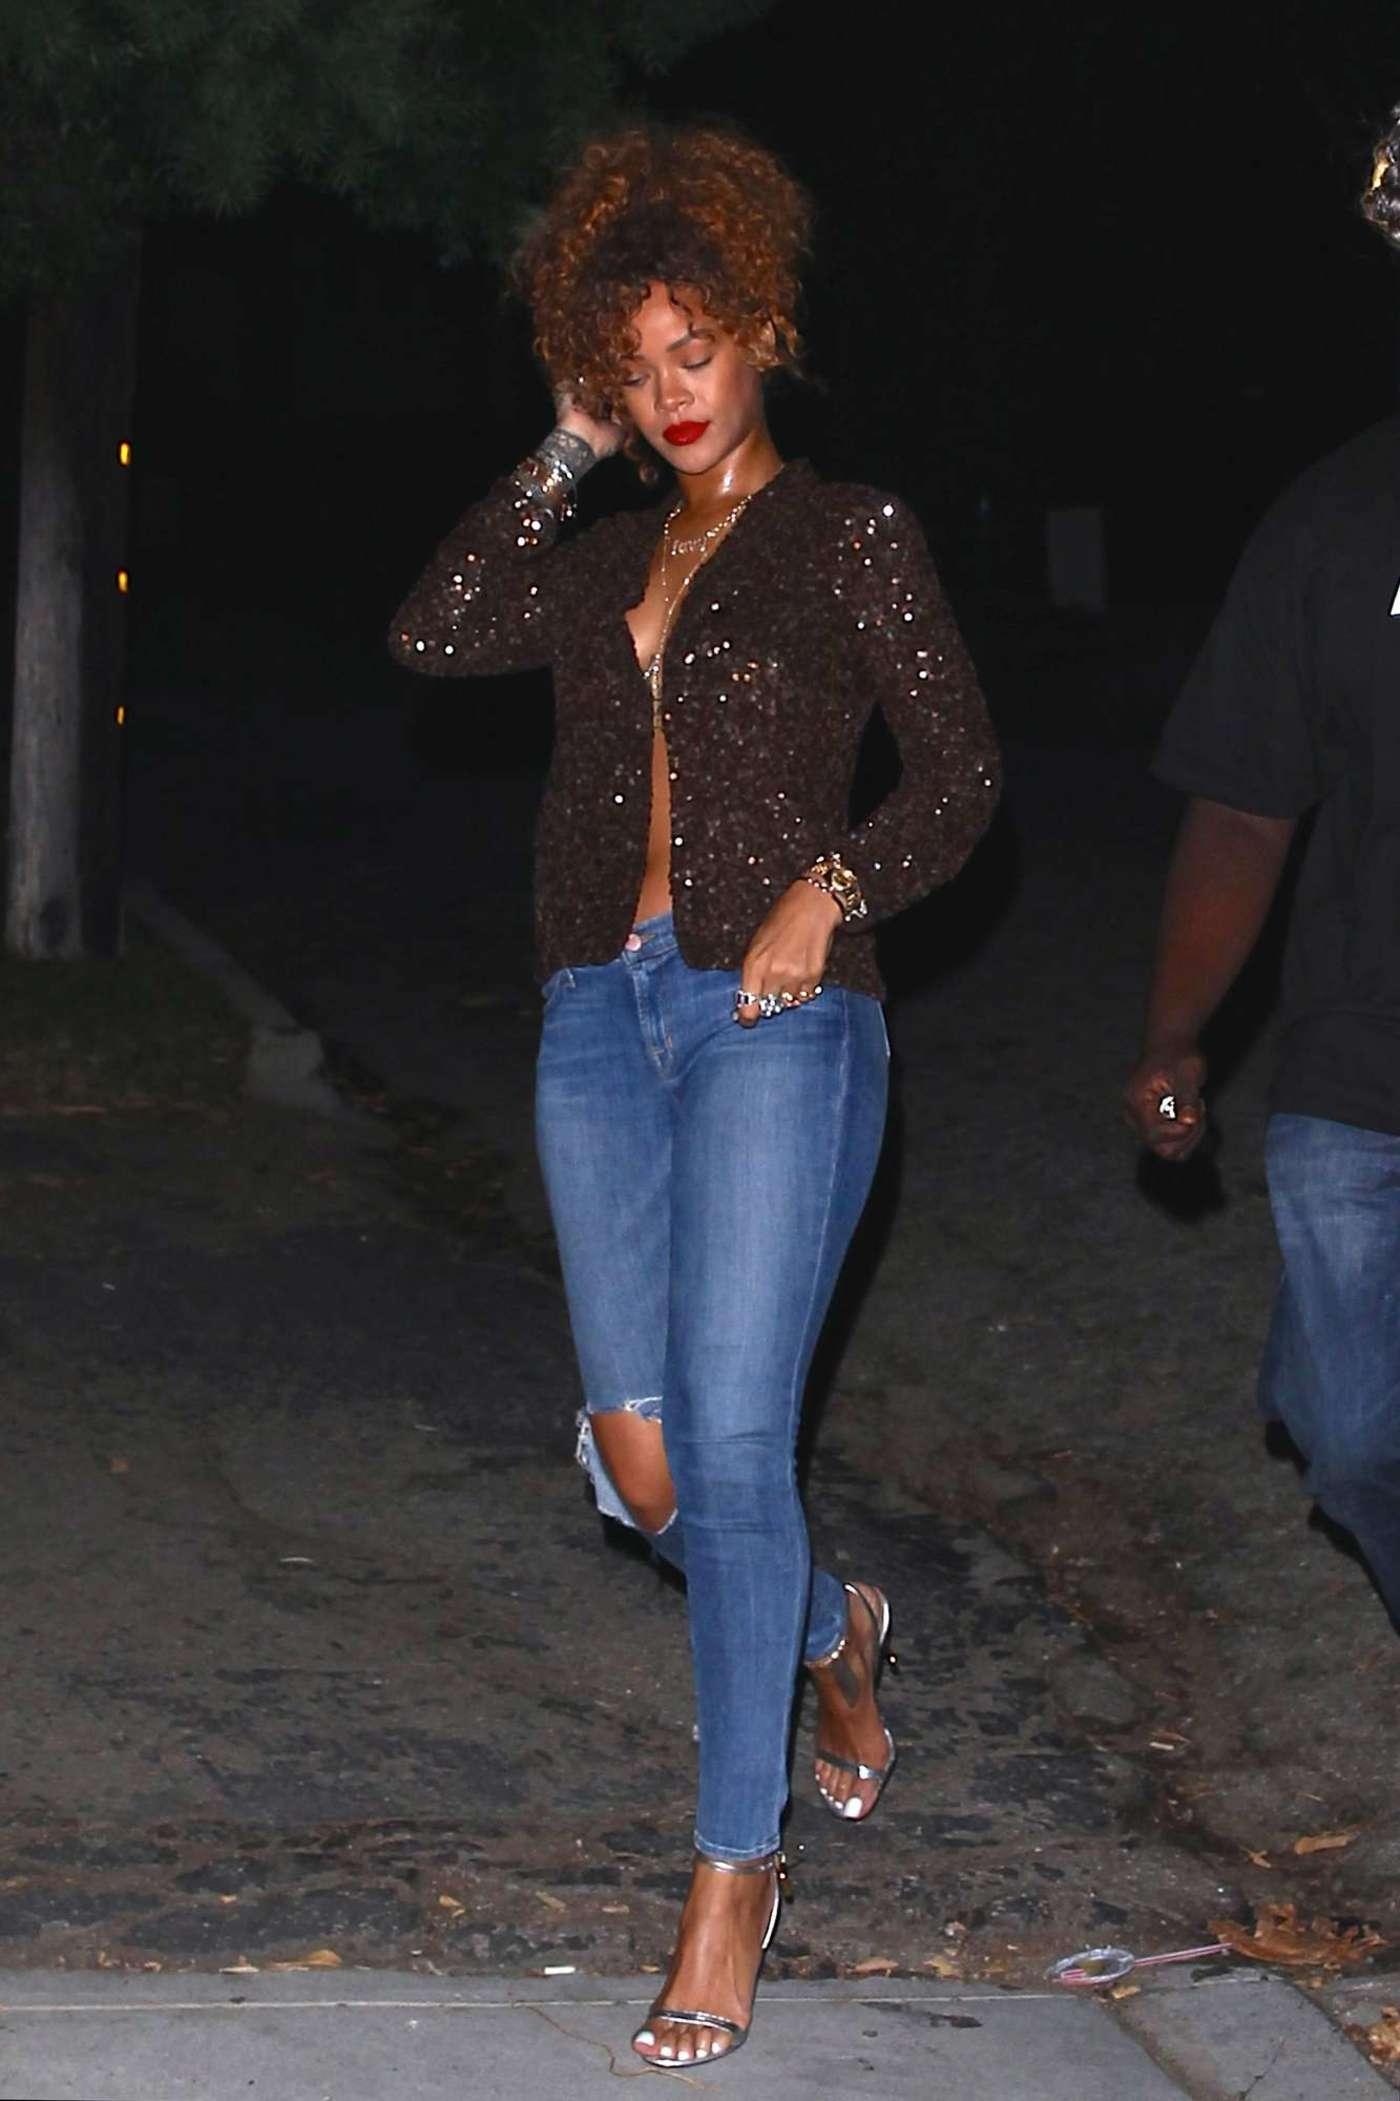 Rihanna in Ripped Jeans -01 - GotCeleb